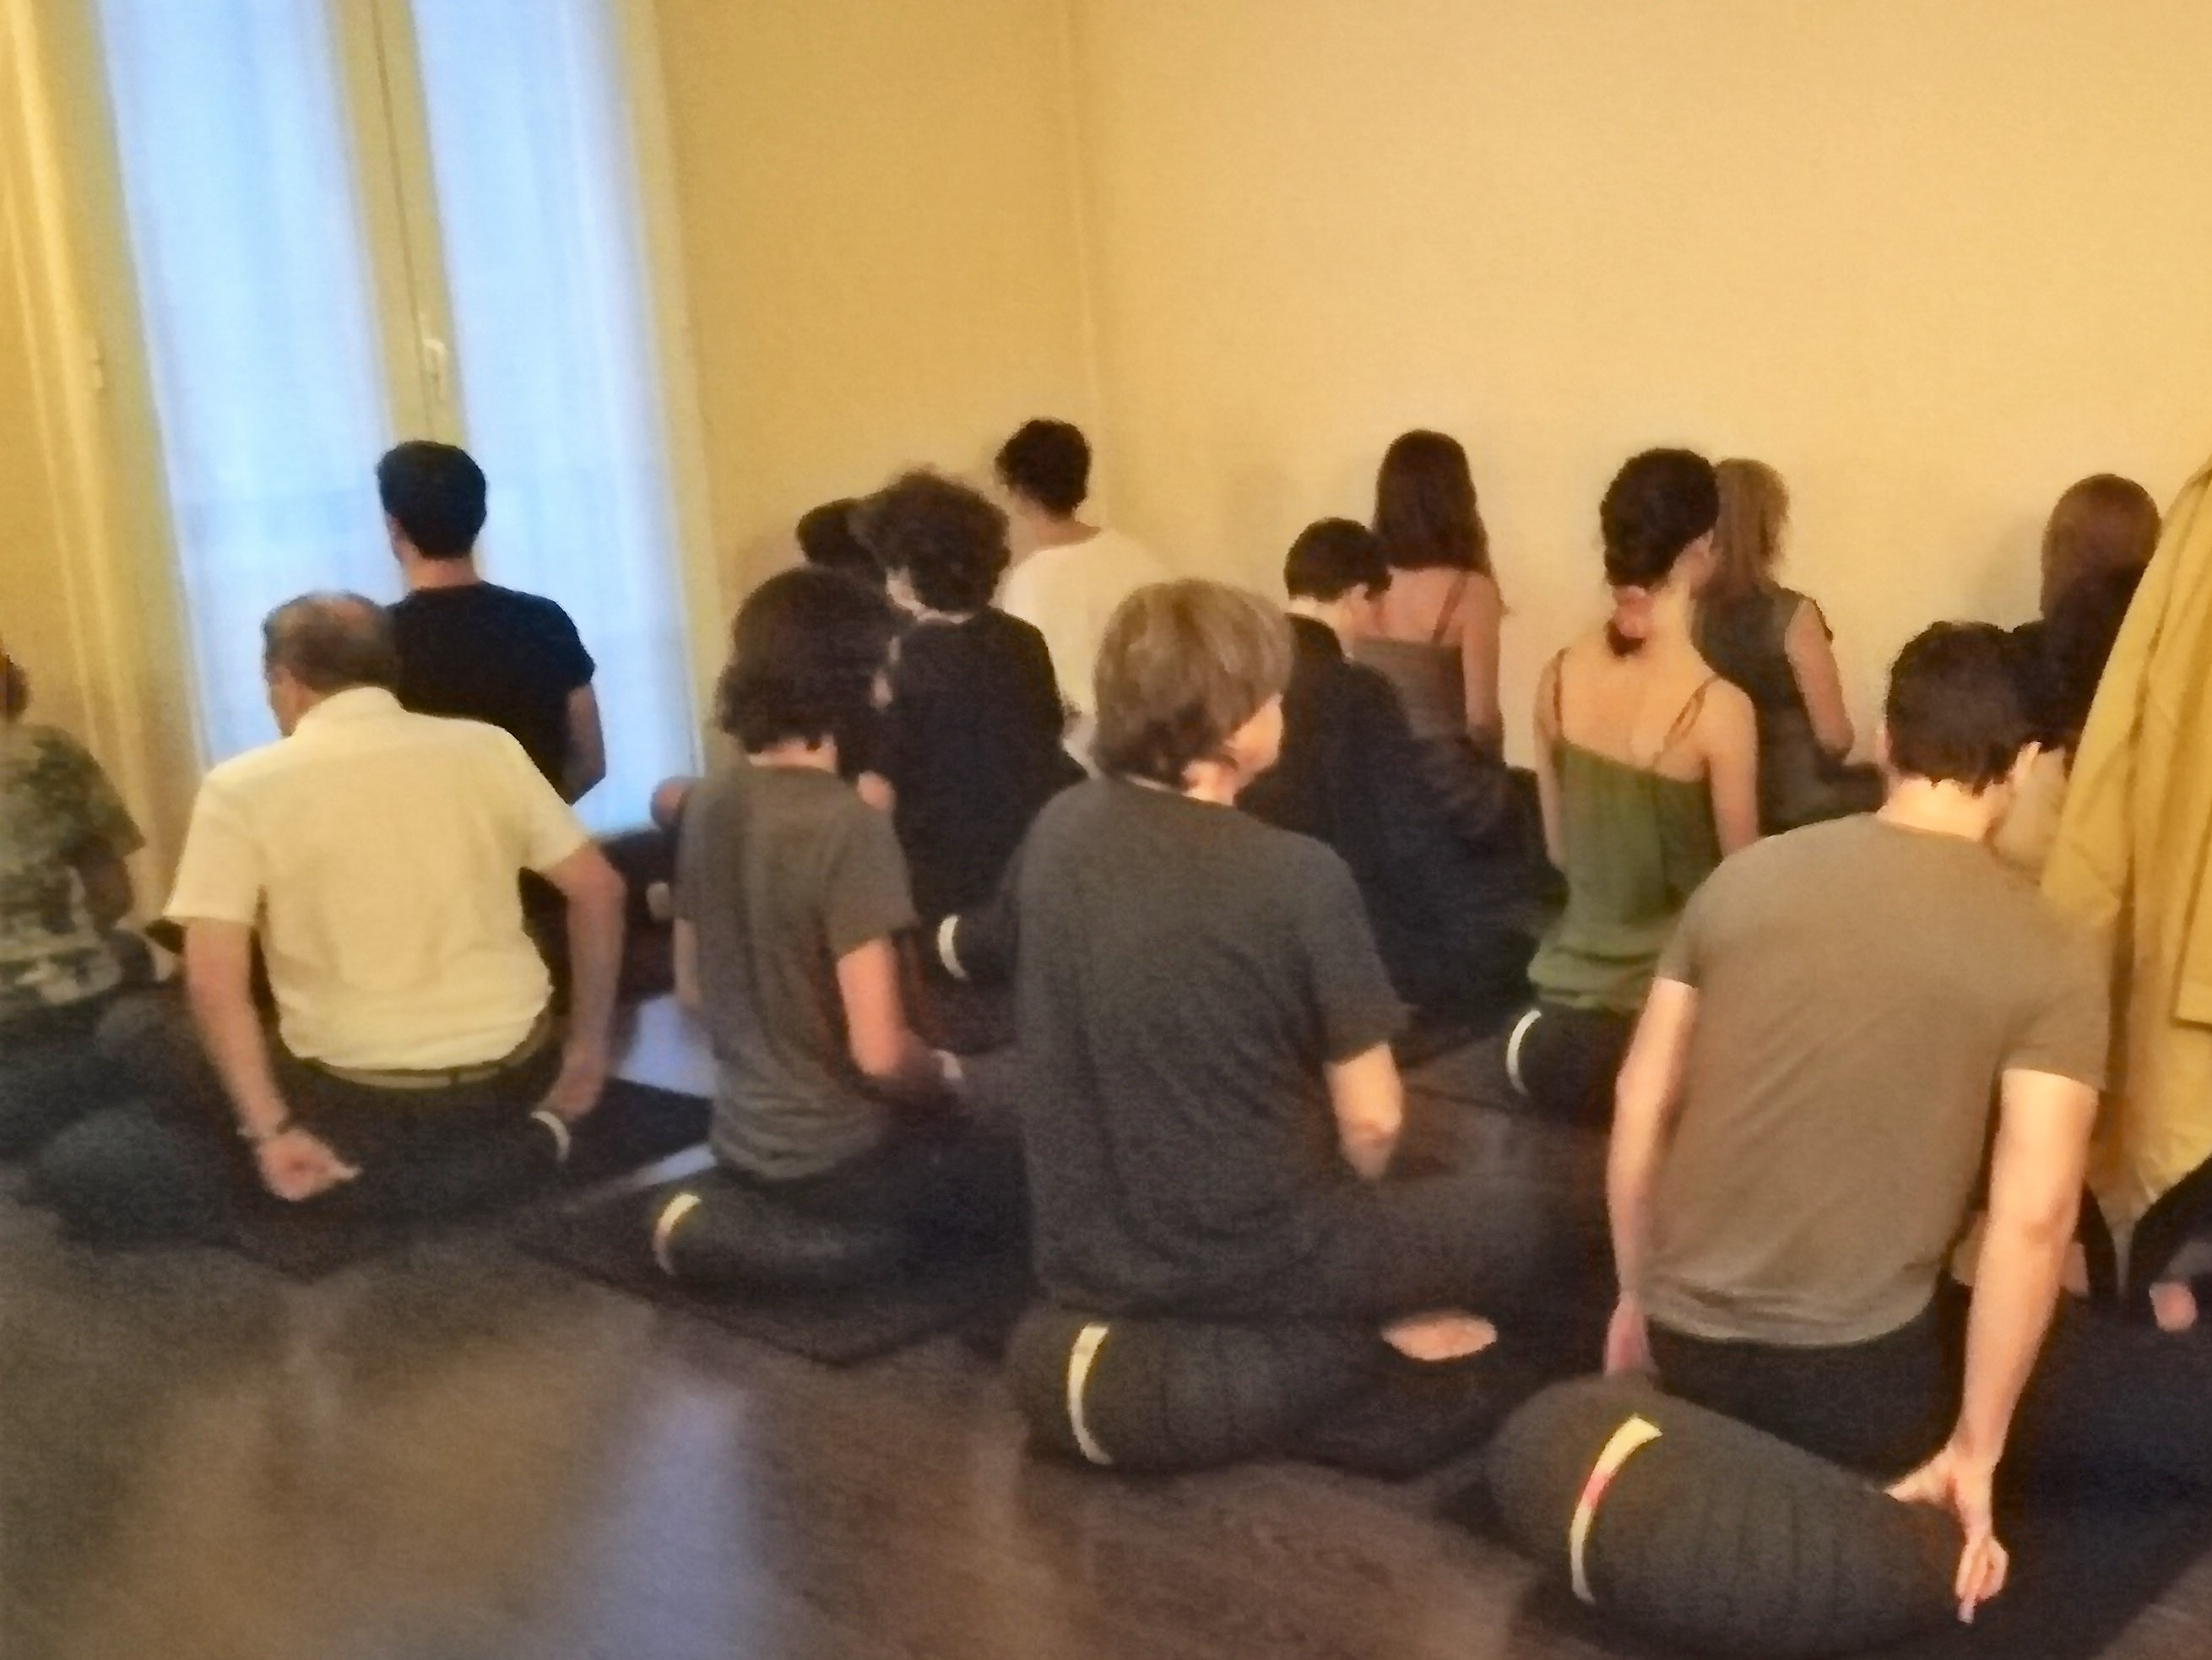 Dojo Zen | Budismo Zen en Barcelona | La Nit de les Religions 2018